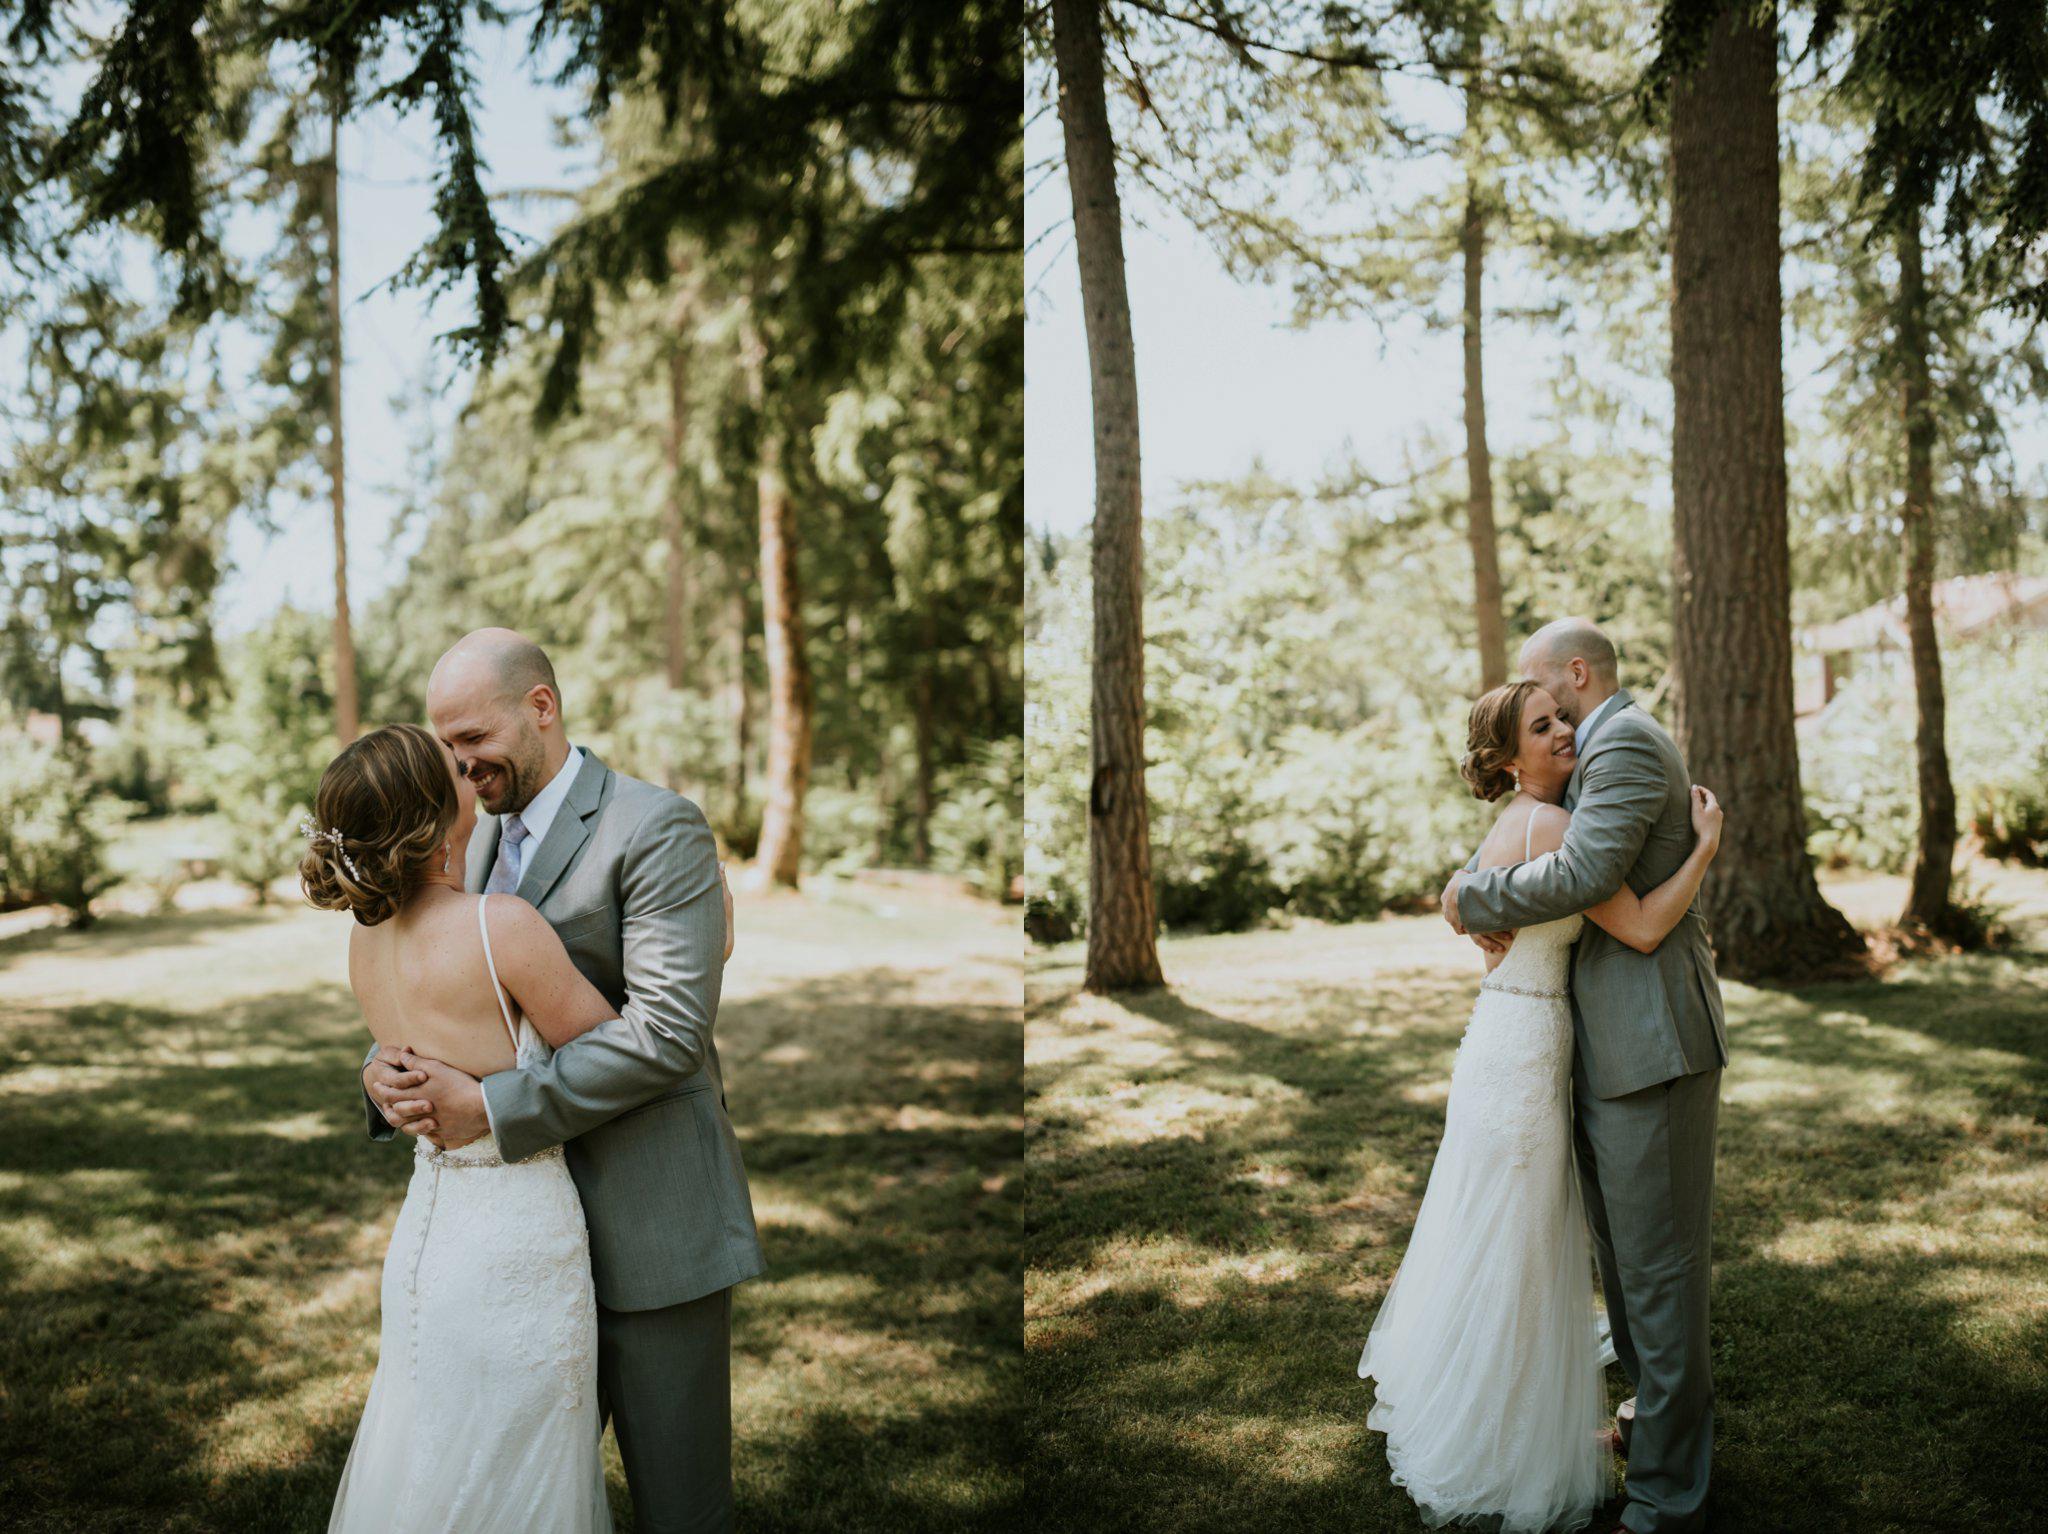 hollywood-school-house-wedding-seattle-photographer-caitlyn-nikula-38.jpg